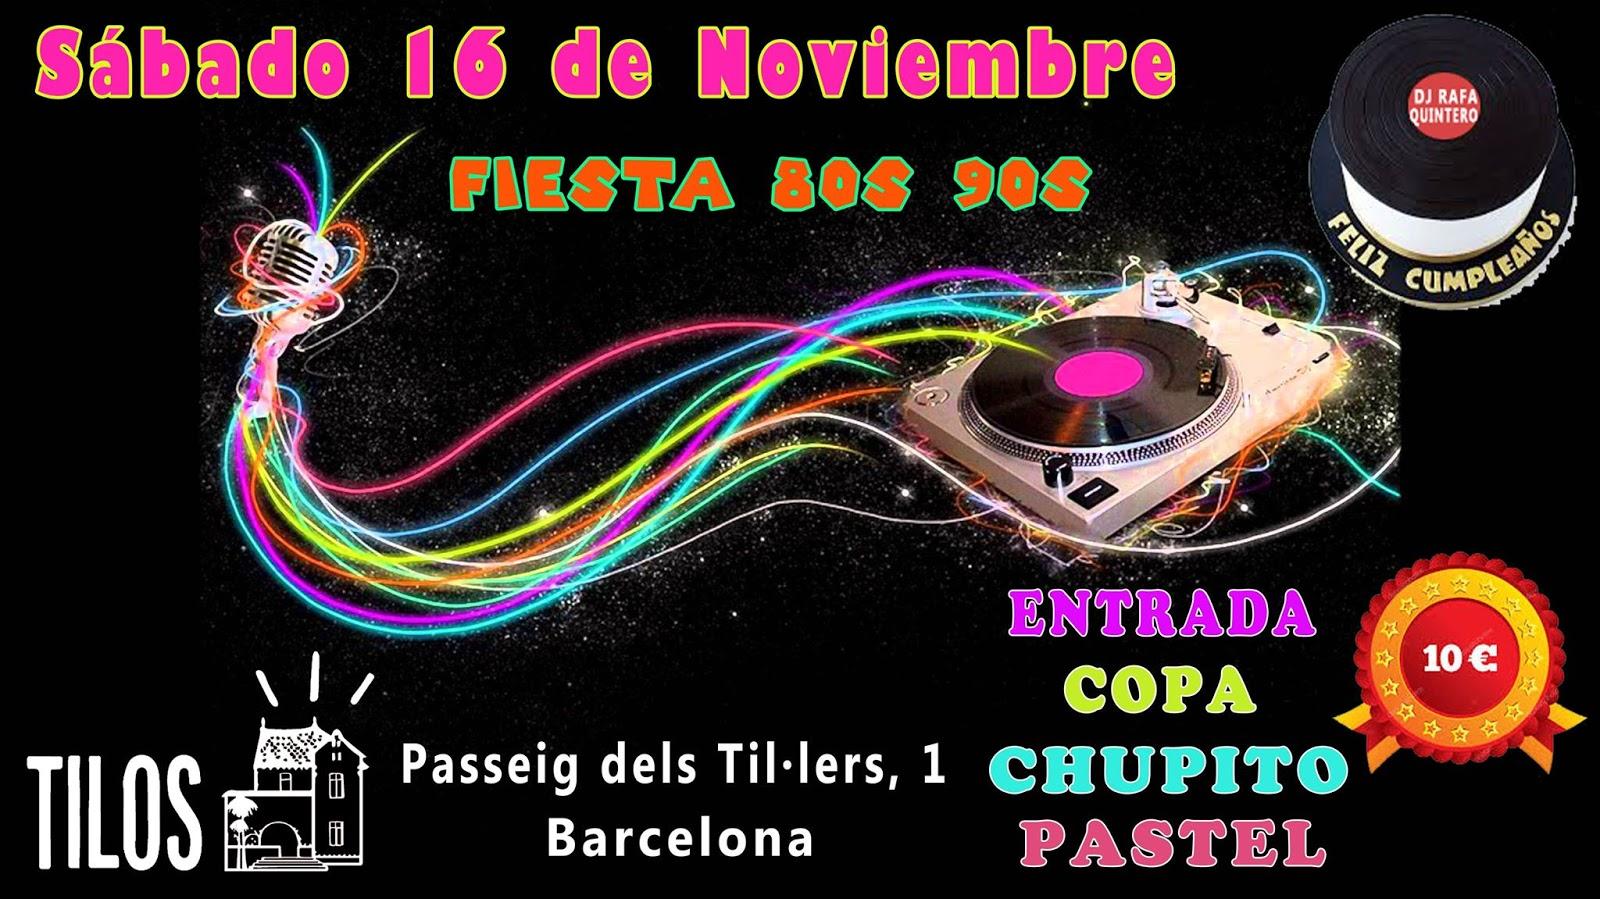 Flyer Fiesta 80s 90s (Cumpleaños DJ Rafa Quintero)